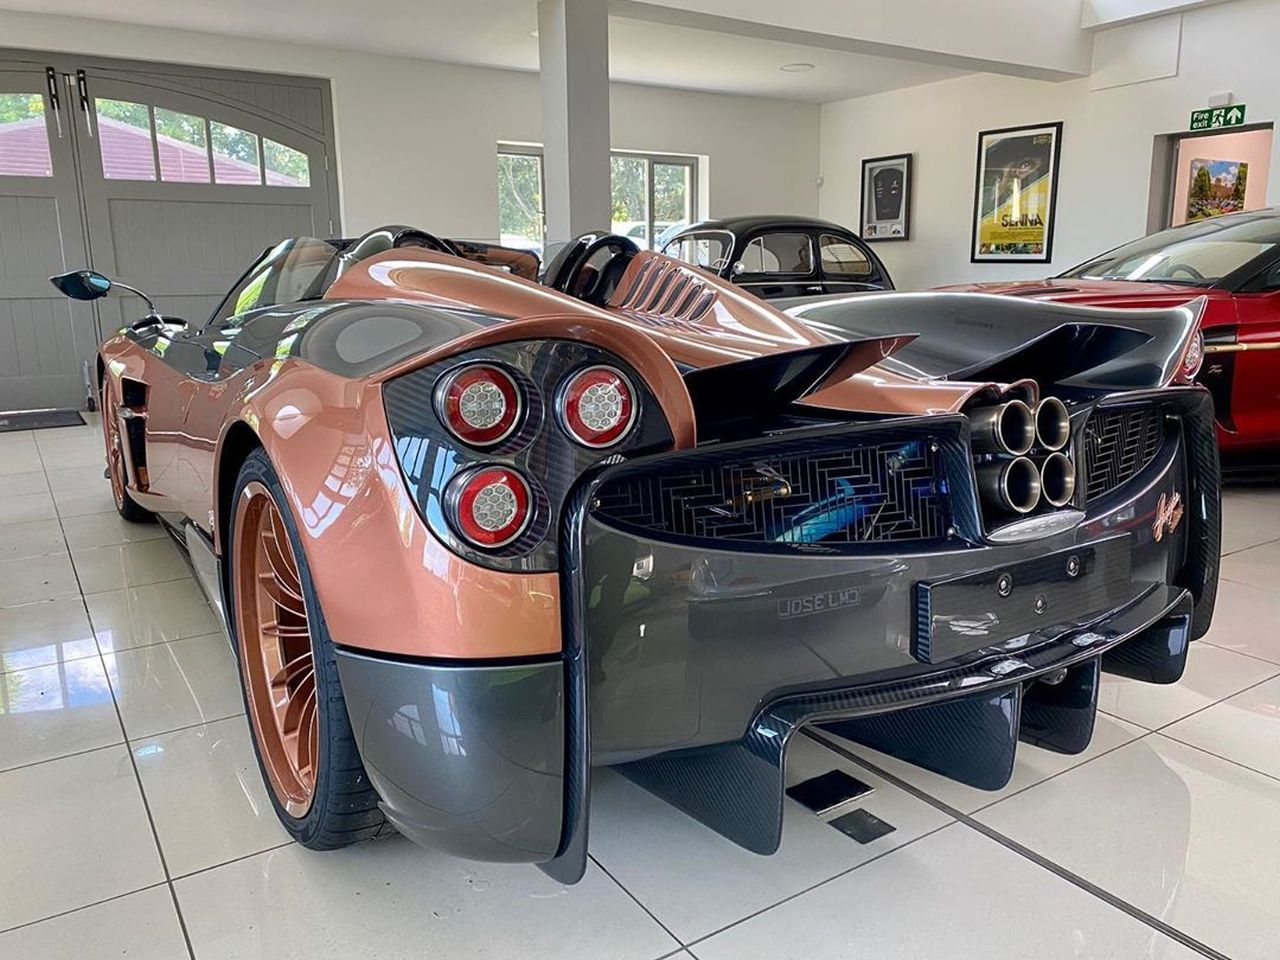 Kurota Copper Pagani Huayra Roadster-2